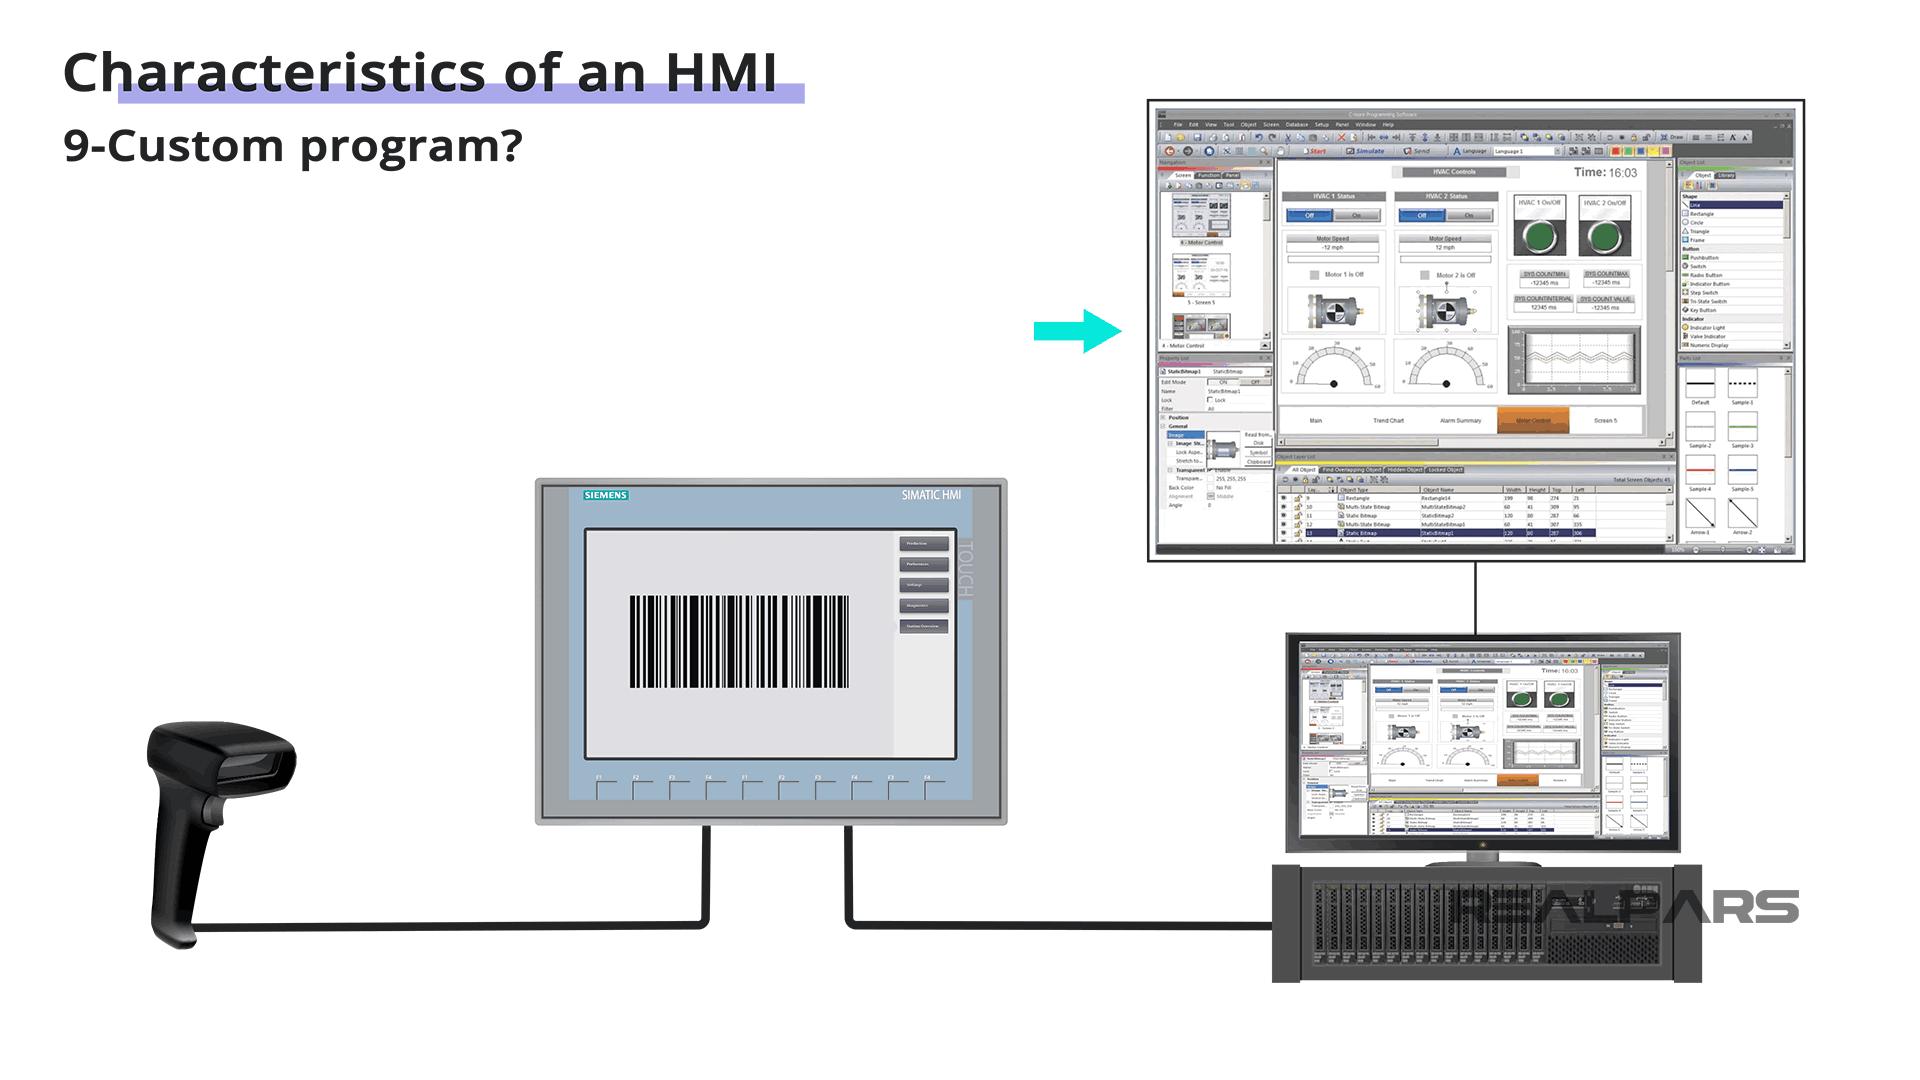 HMI Custom Programs